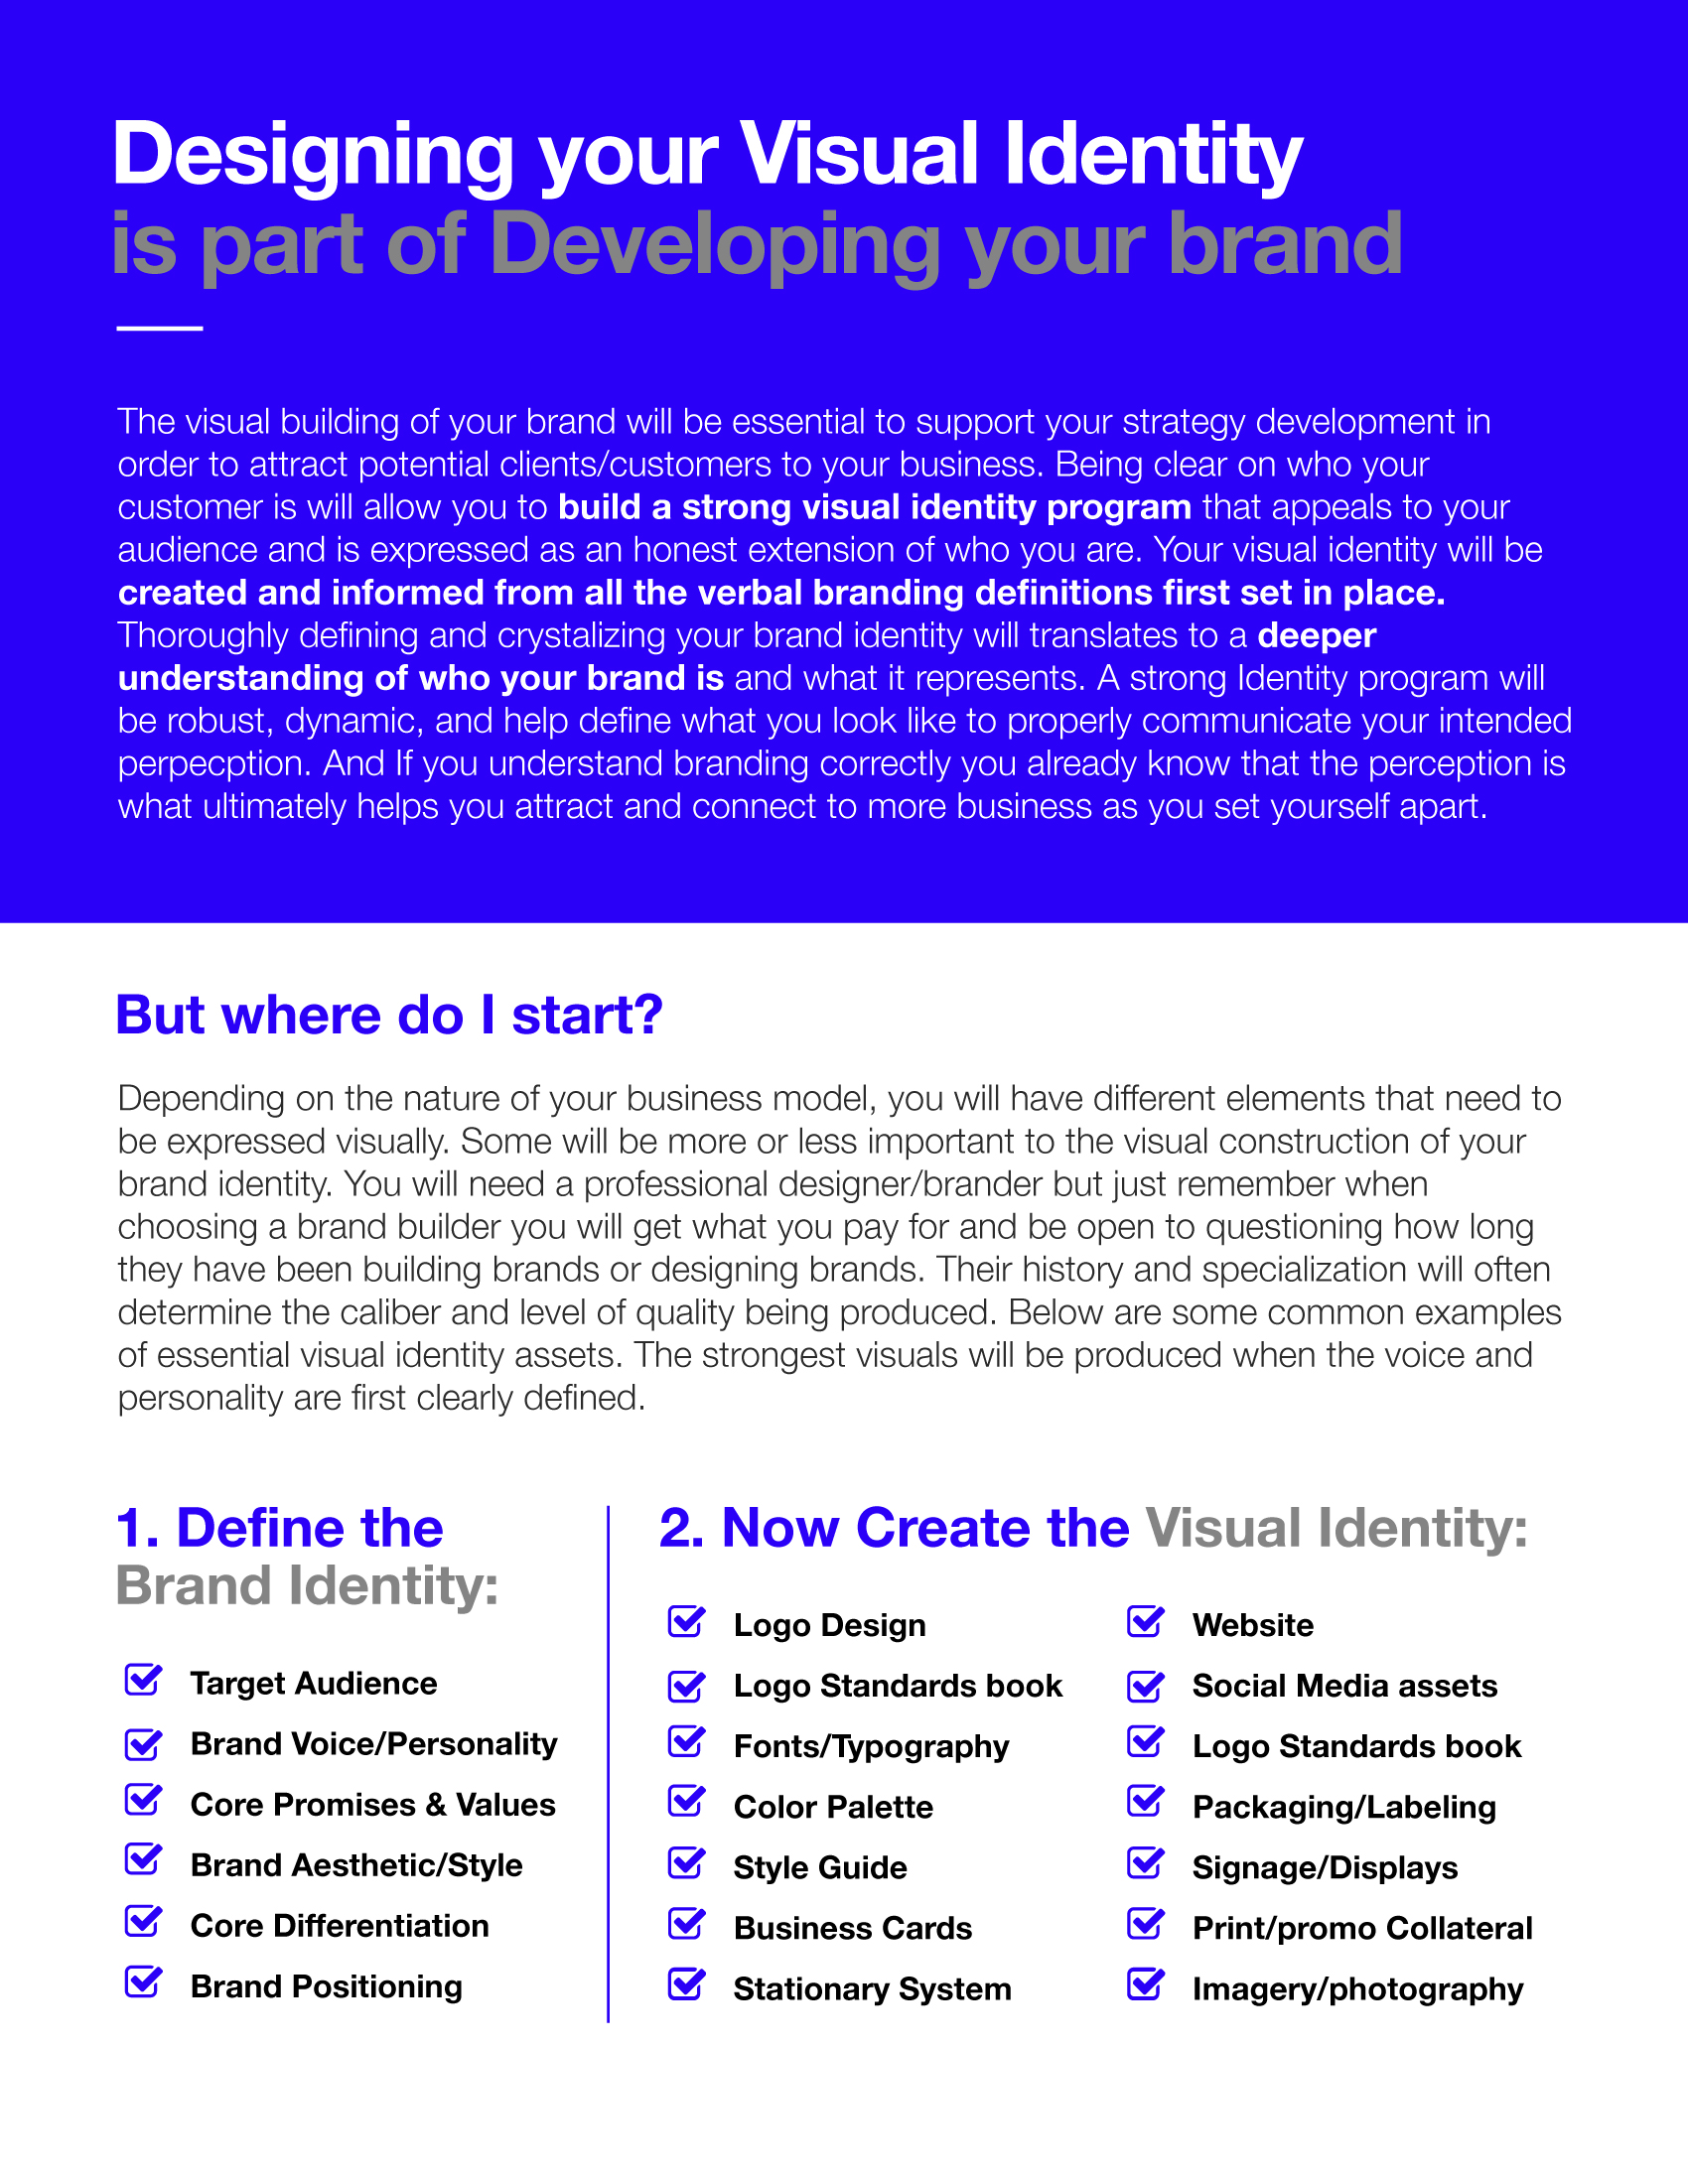 BrandIdentity2.jpg